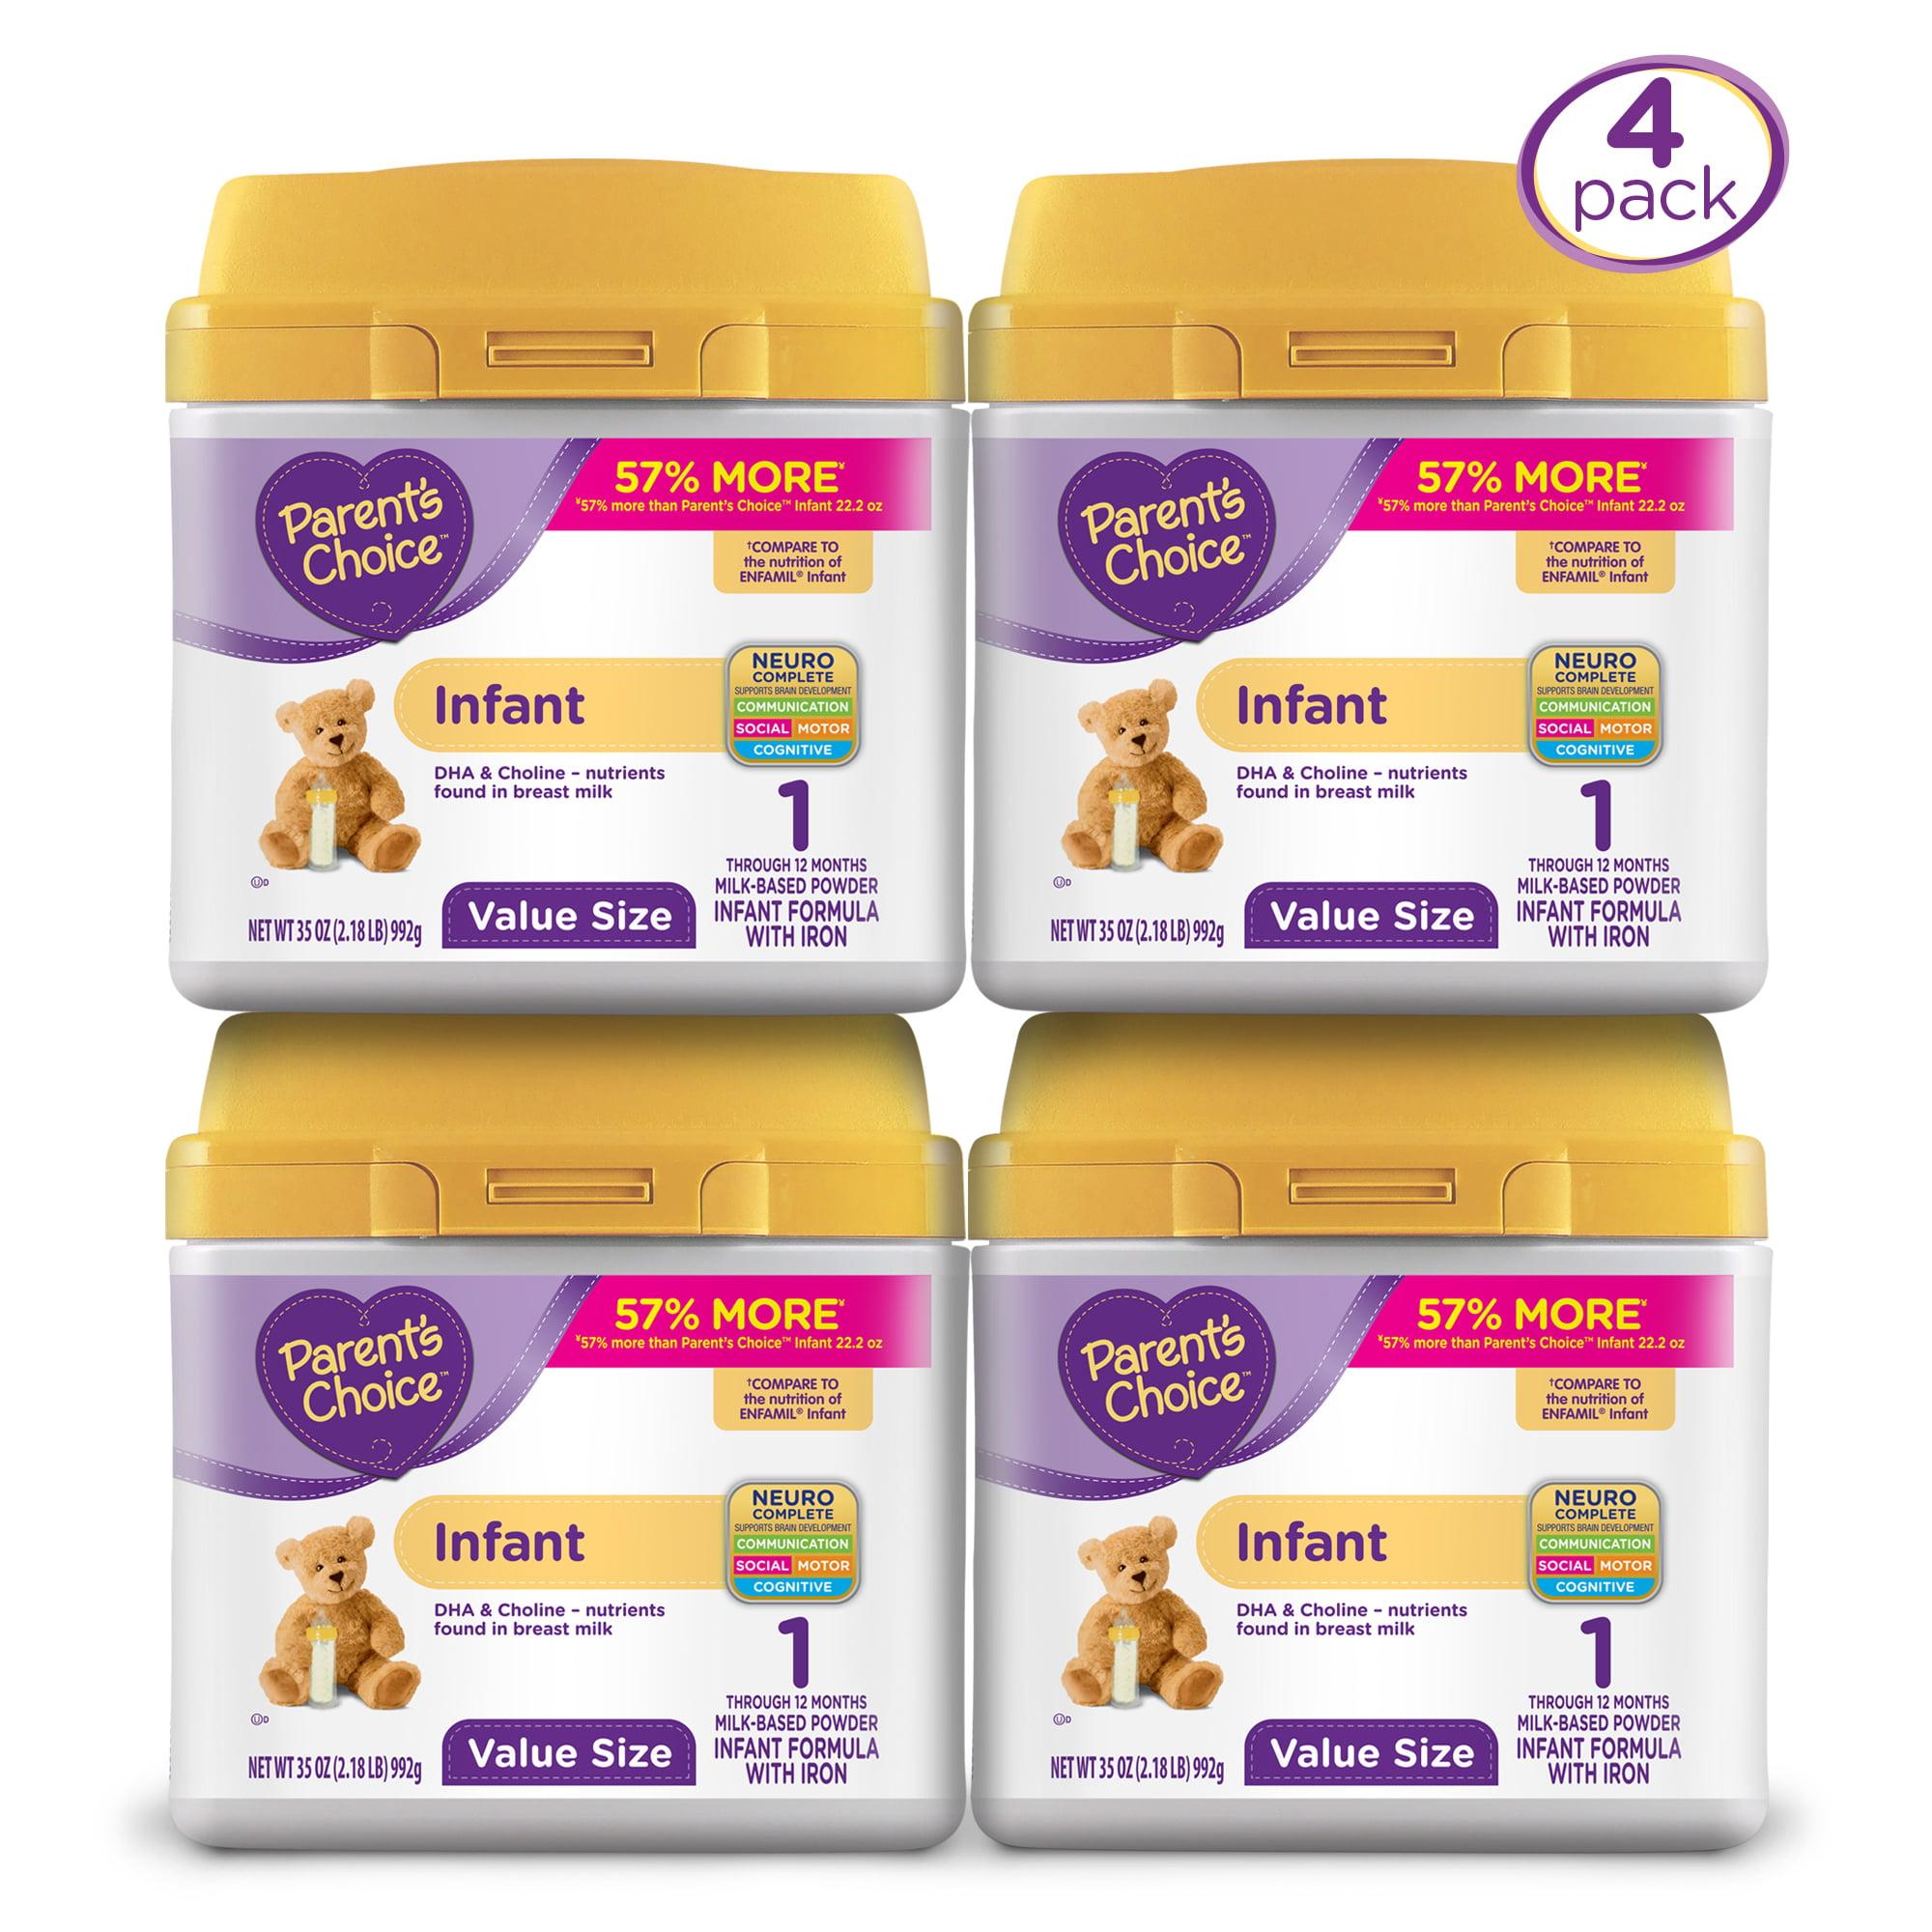 Parent's Choice Infant Powder Formula (4 Pack) with Iron, 35oz by Parent%27s Choice